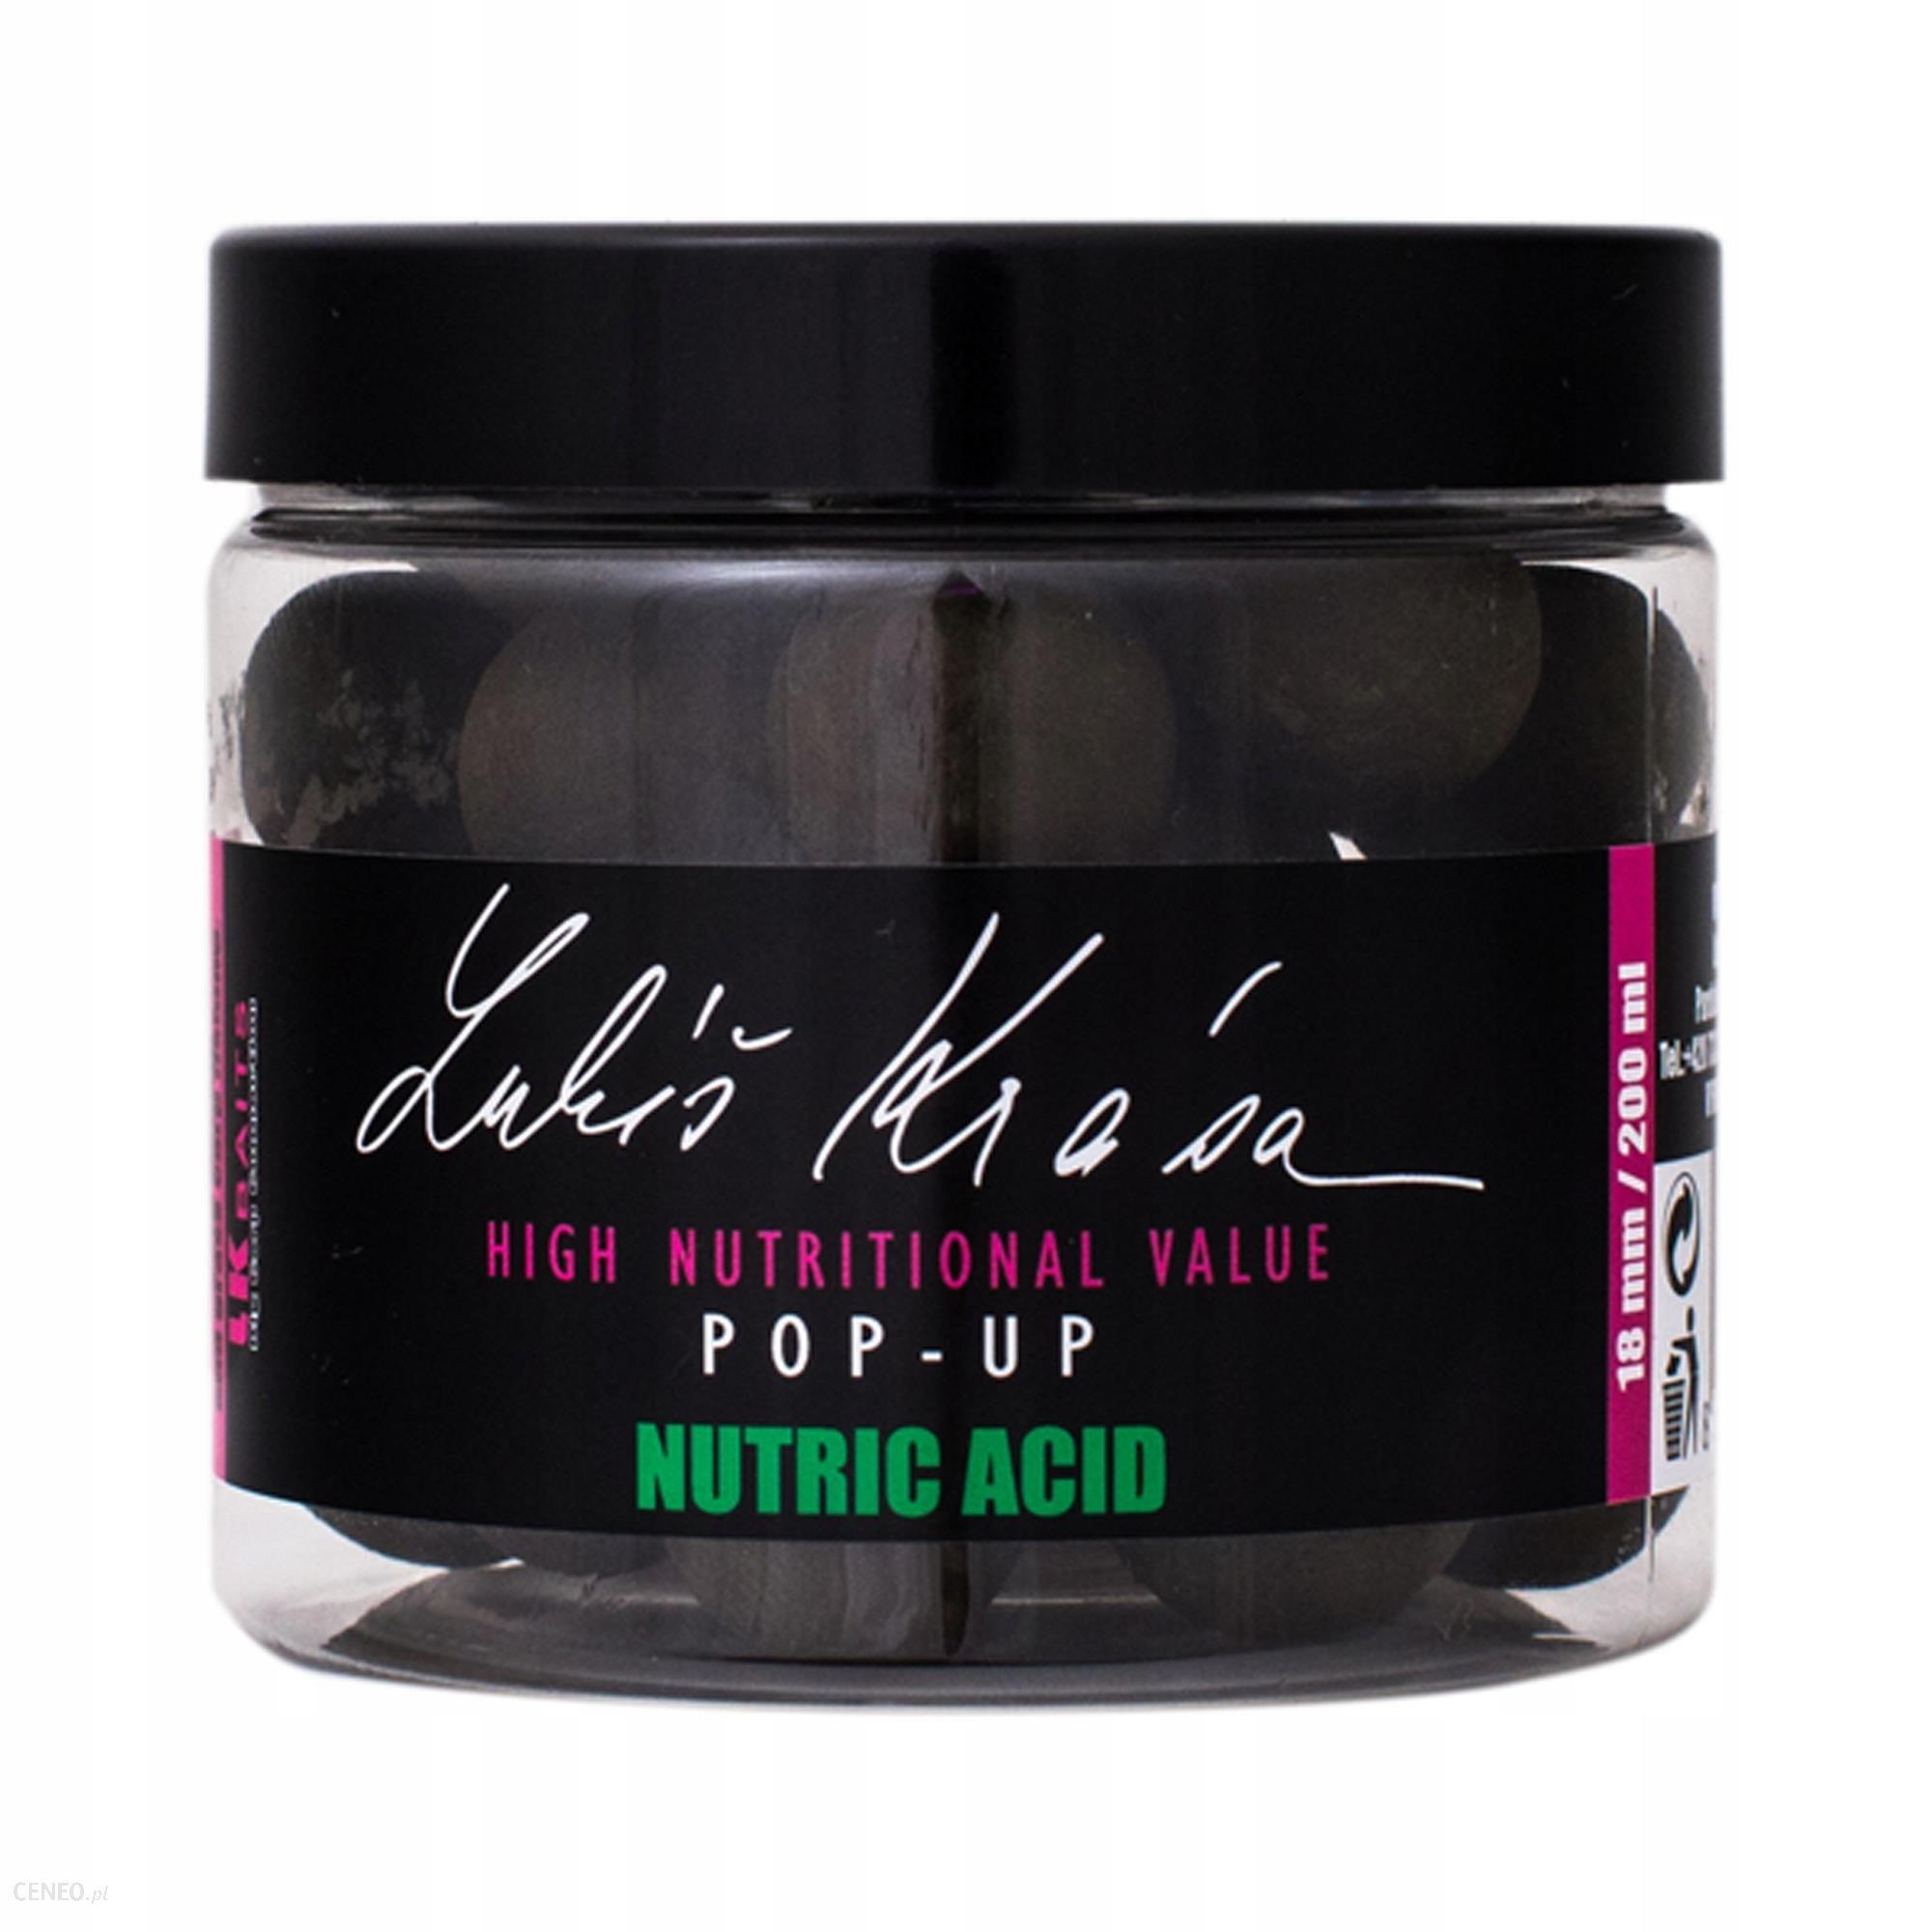 Lk Baits Pop Up Lukas Krasa Nutric Acid 18mm 200ml